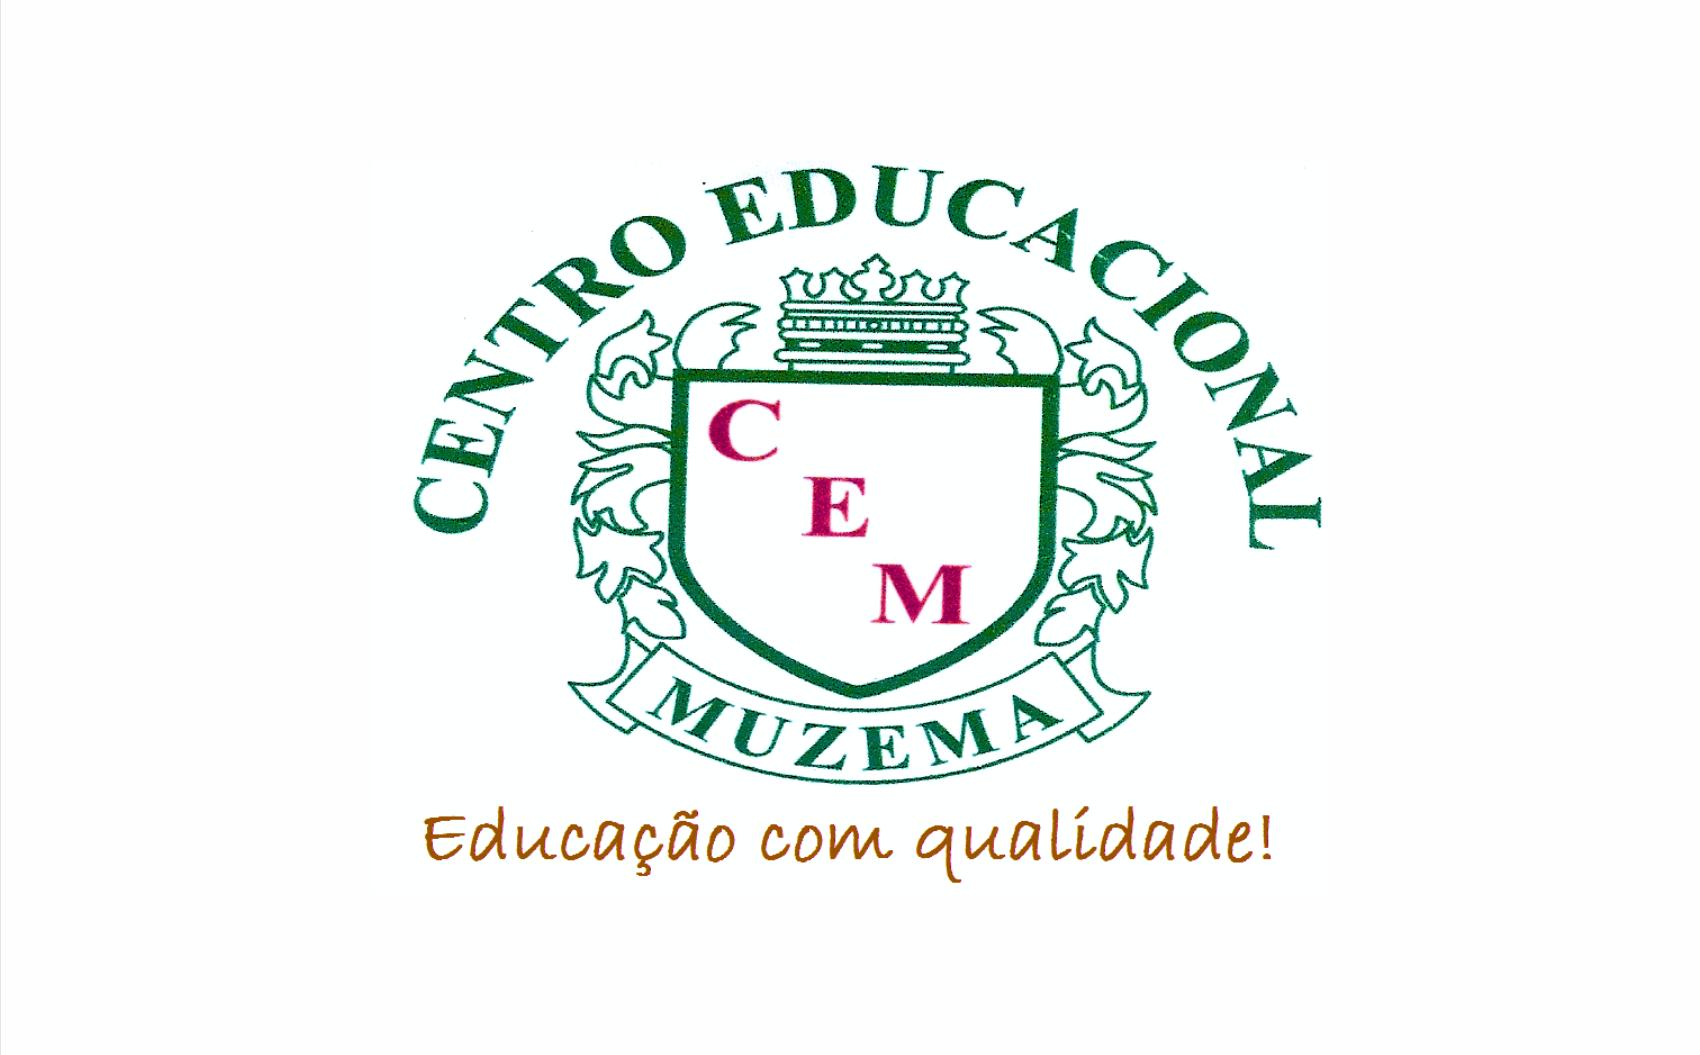 Centro Educacional Muzema